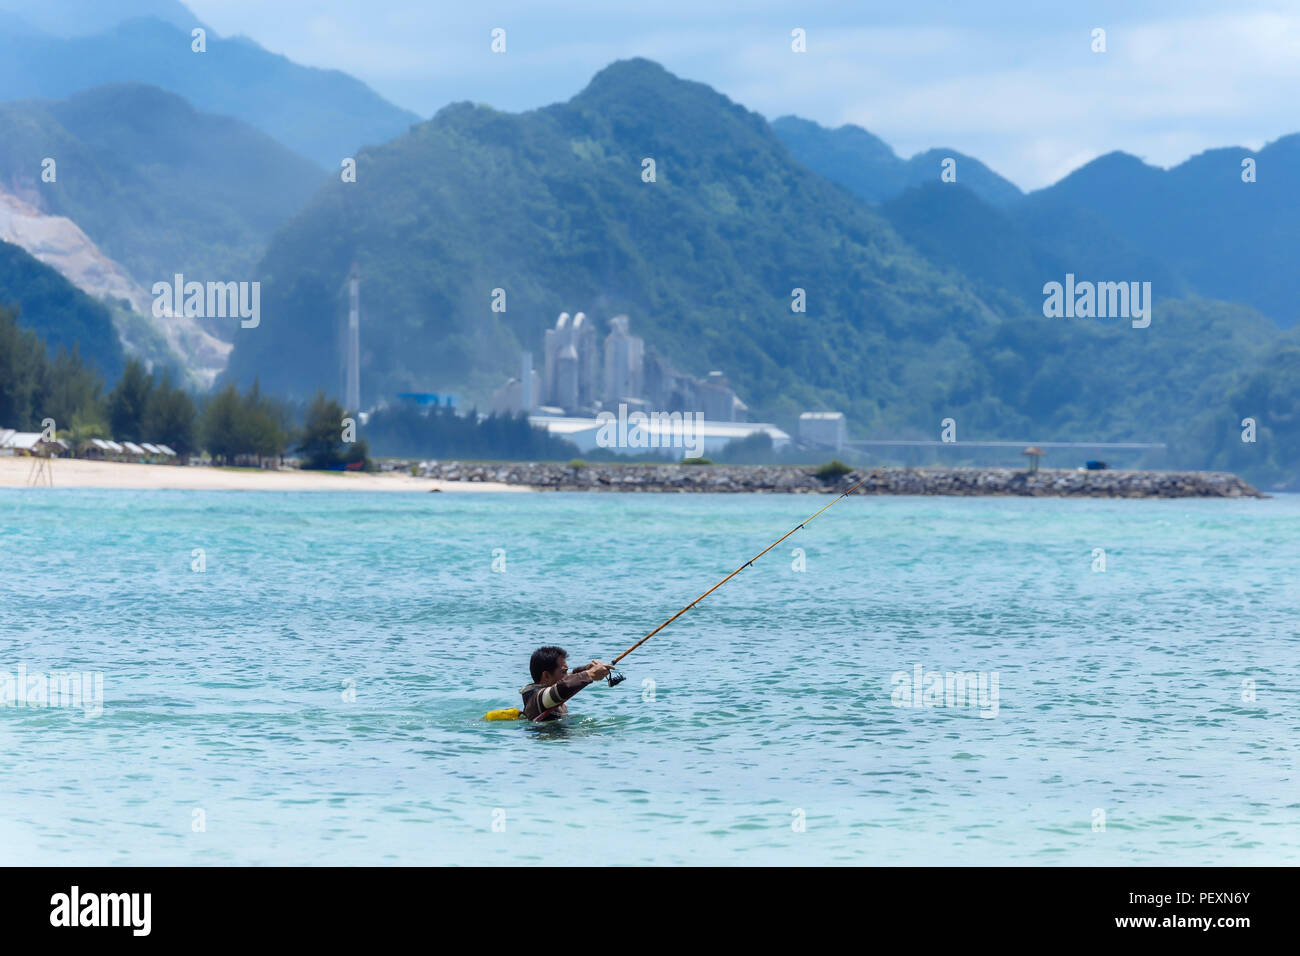 Fisherman in sea with fishing rod, Banda Aceh, Sumatra, Indonesia - Stock Image